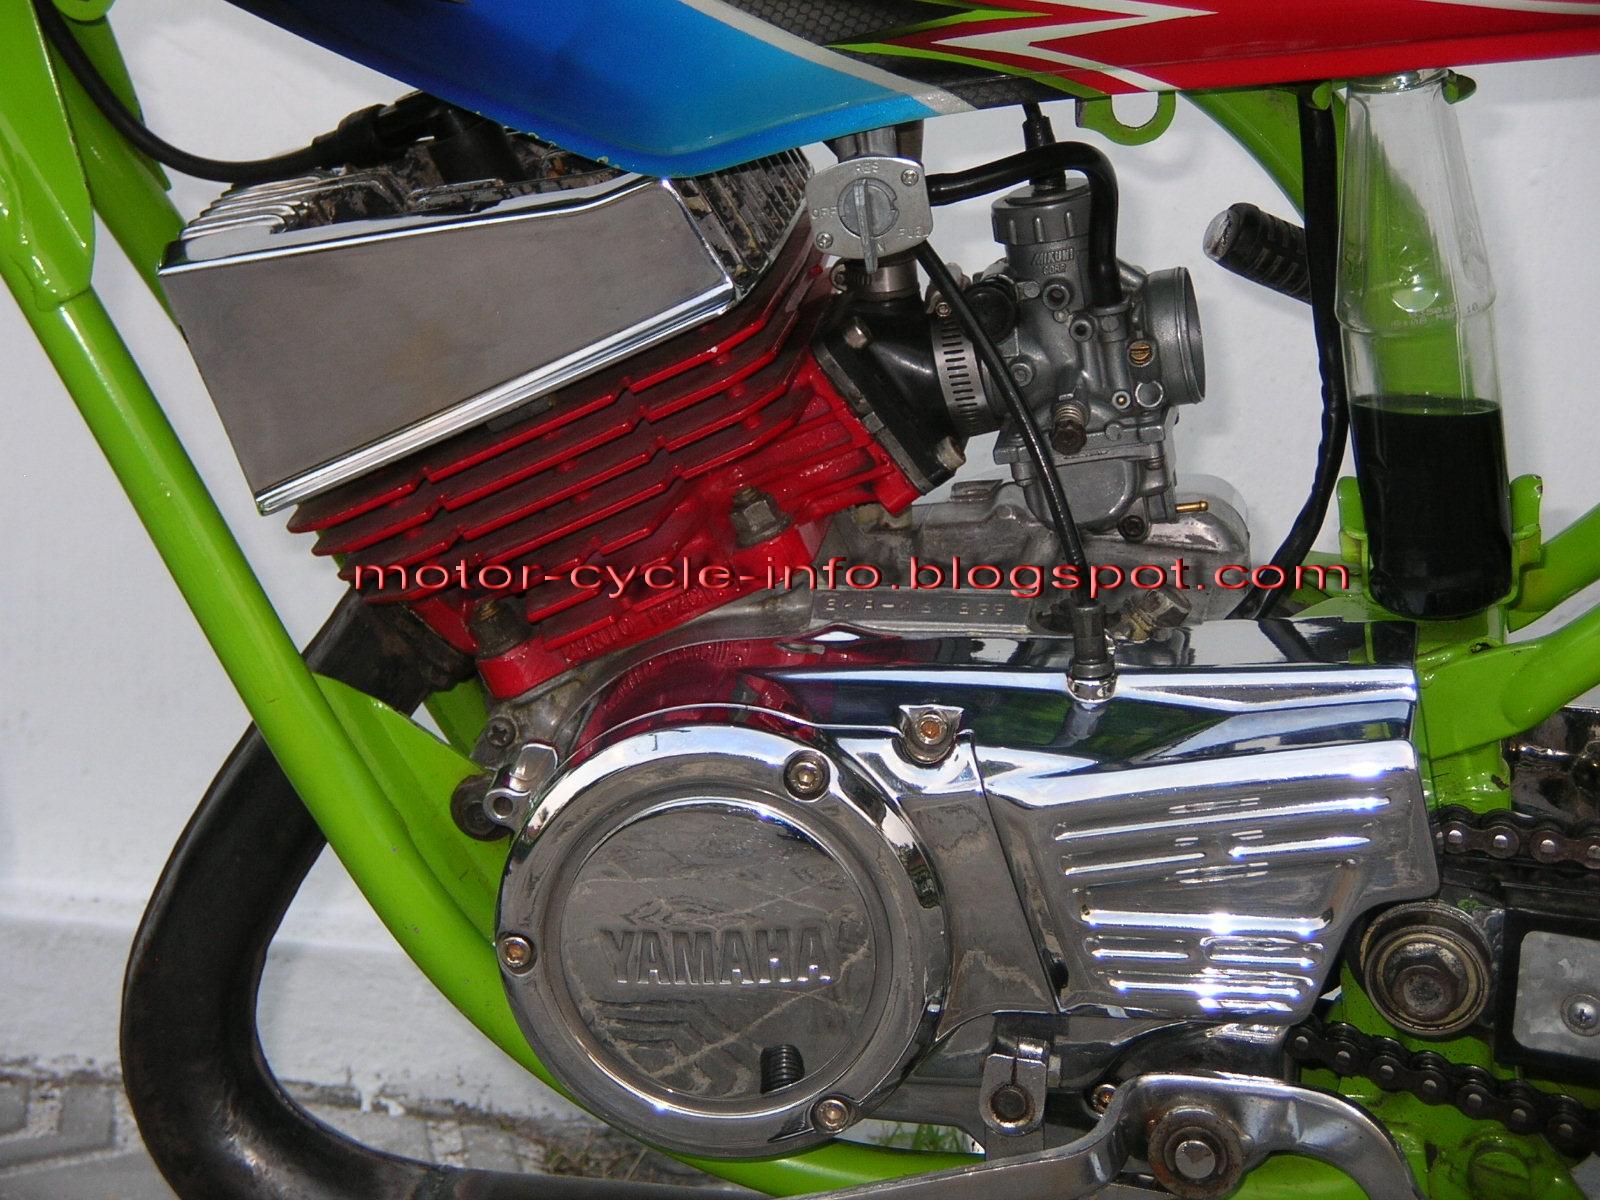 Rx King Standar Modifikasi Motor Modifikasi Yamaha Rx King Standar